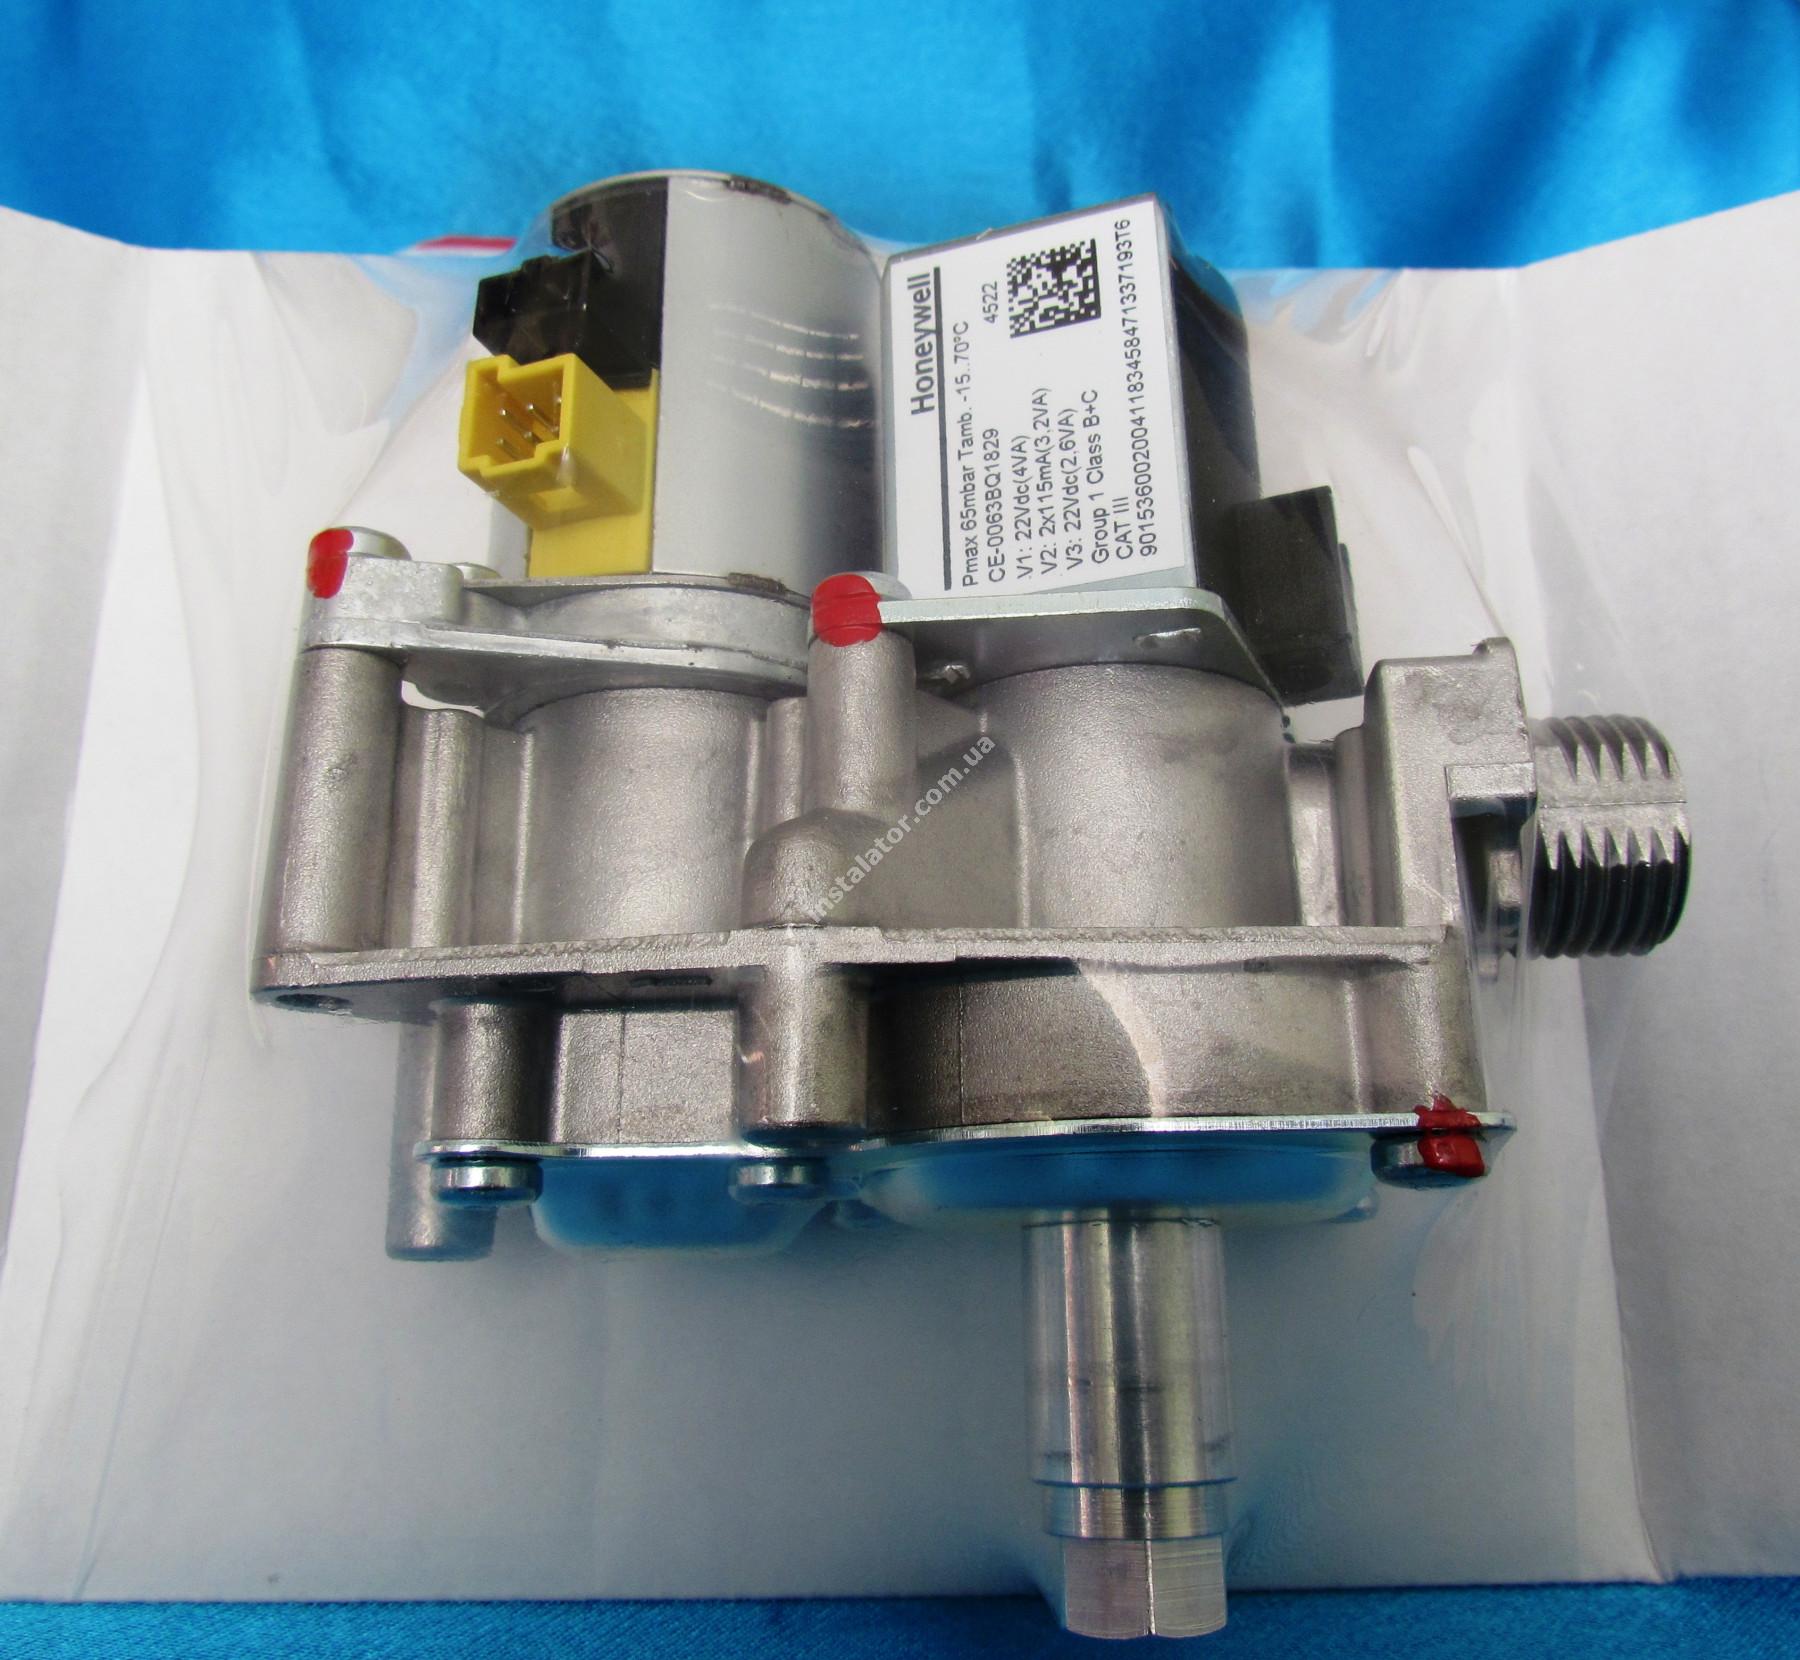 0020049296 Газовый клапан с регулятором PROTHERM/VAILLANT/SAUNIAR DUVAL/ full-image-0